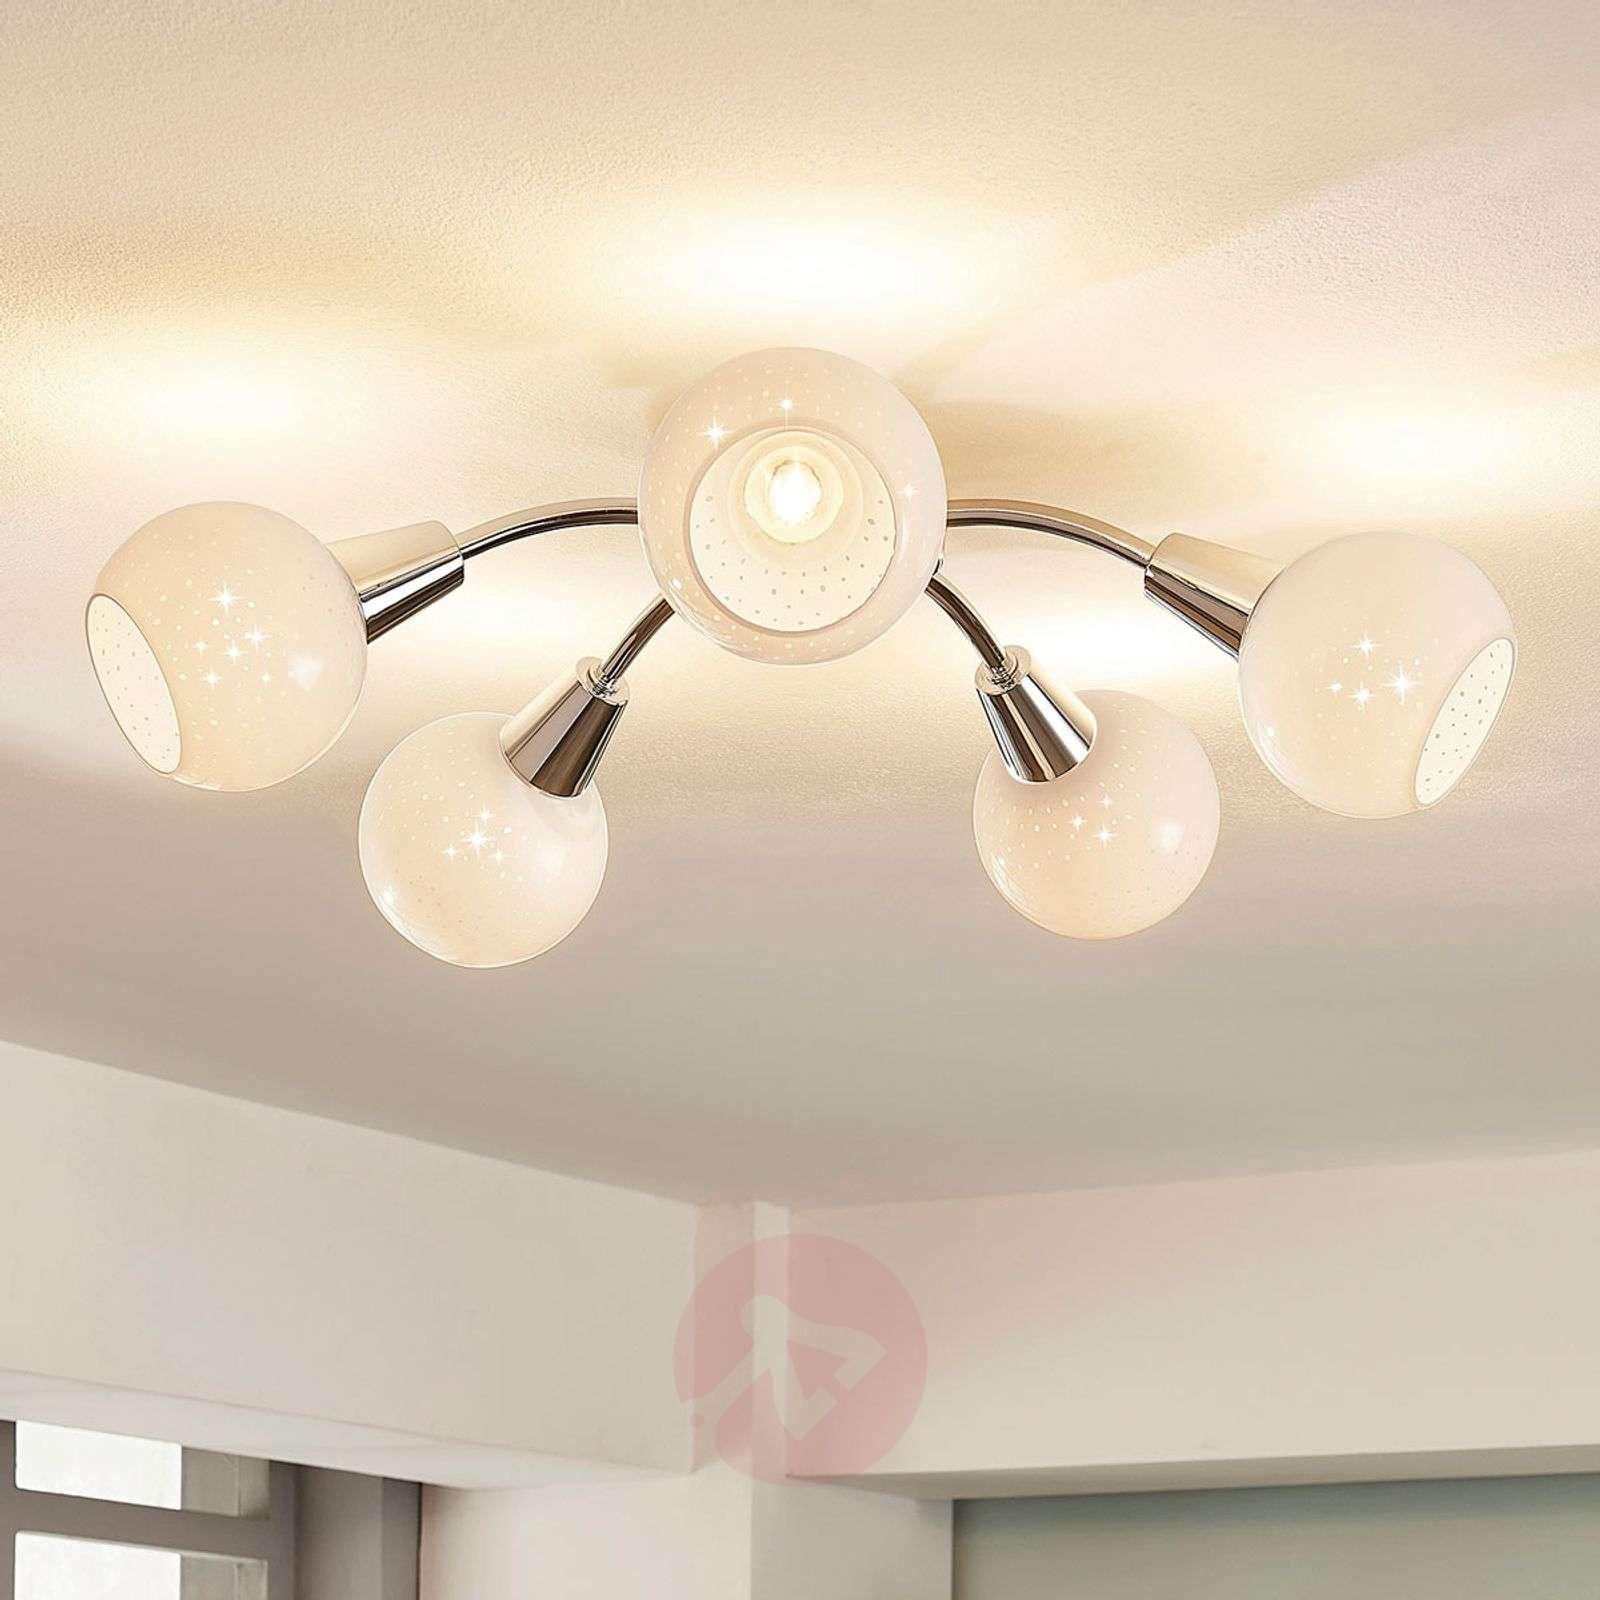 Benedikt round LED ceiling lamp, five-bulb | Lights.ie